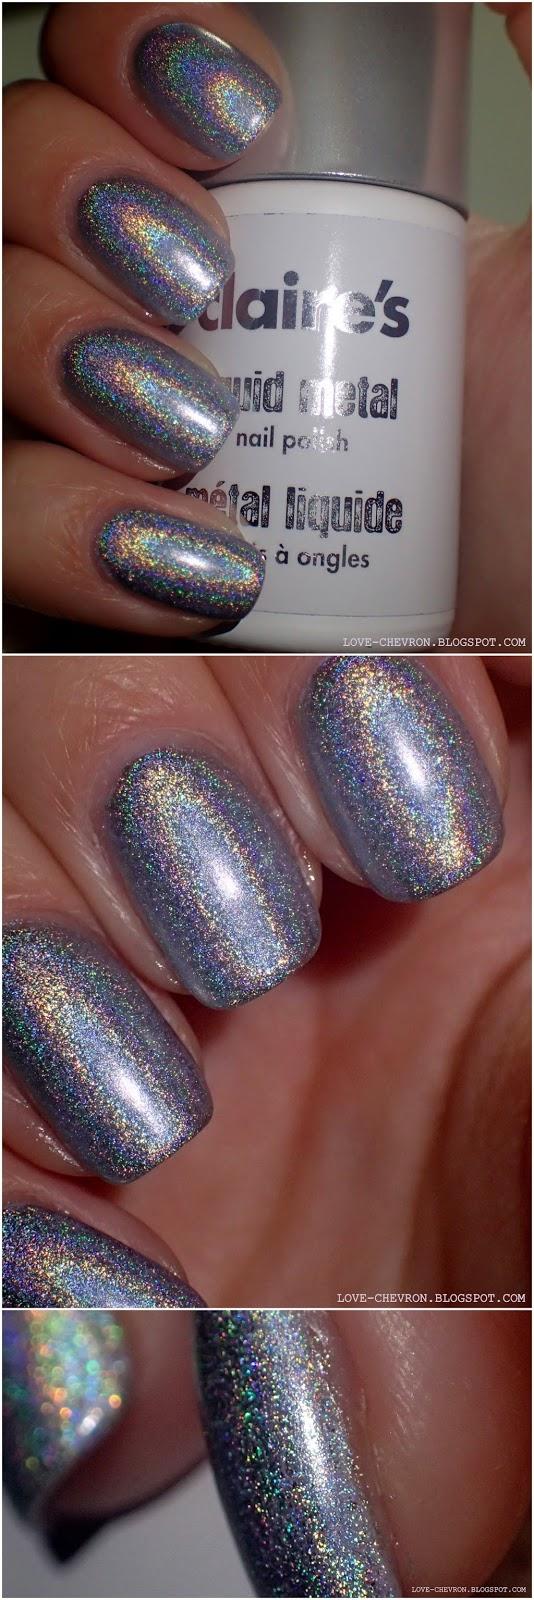 claire's silver liquid metal